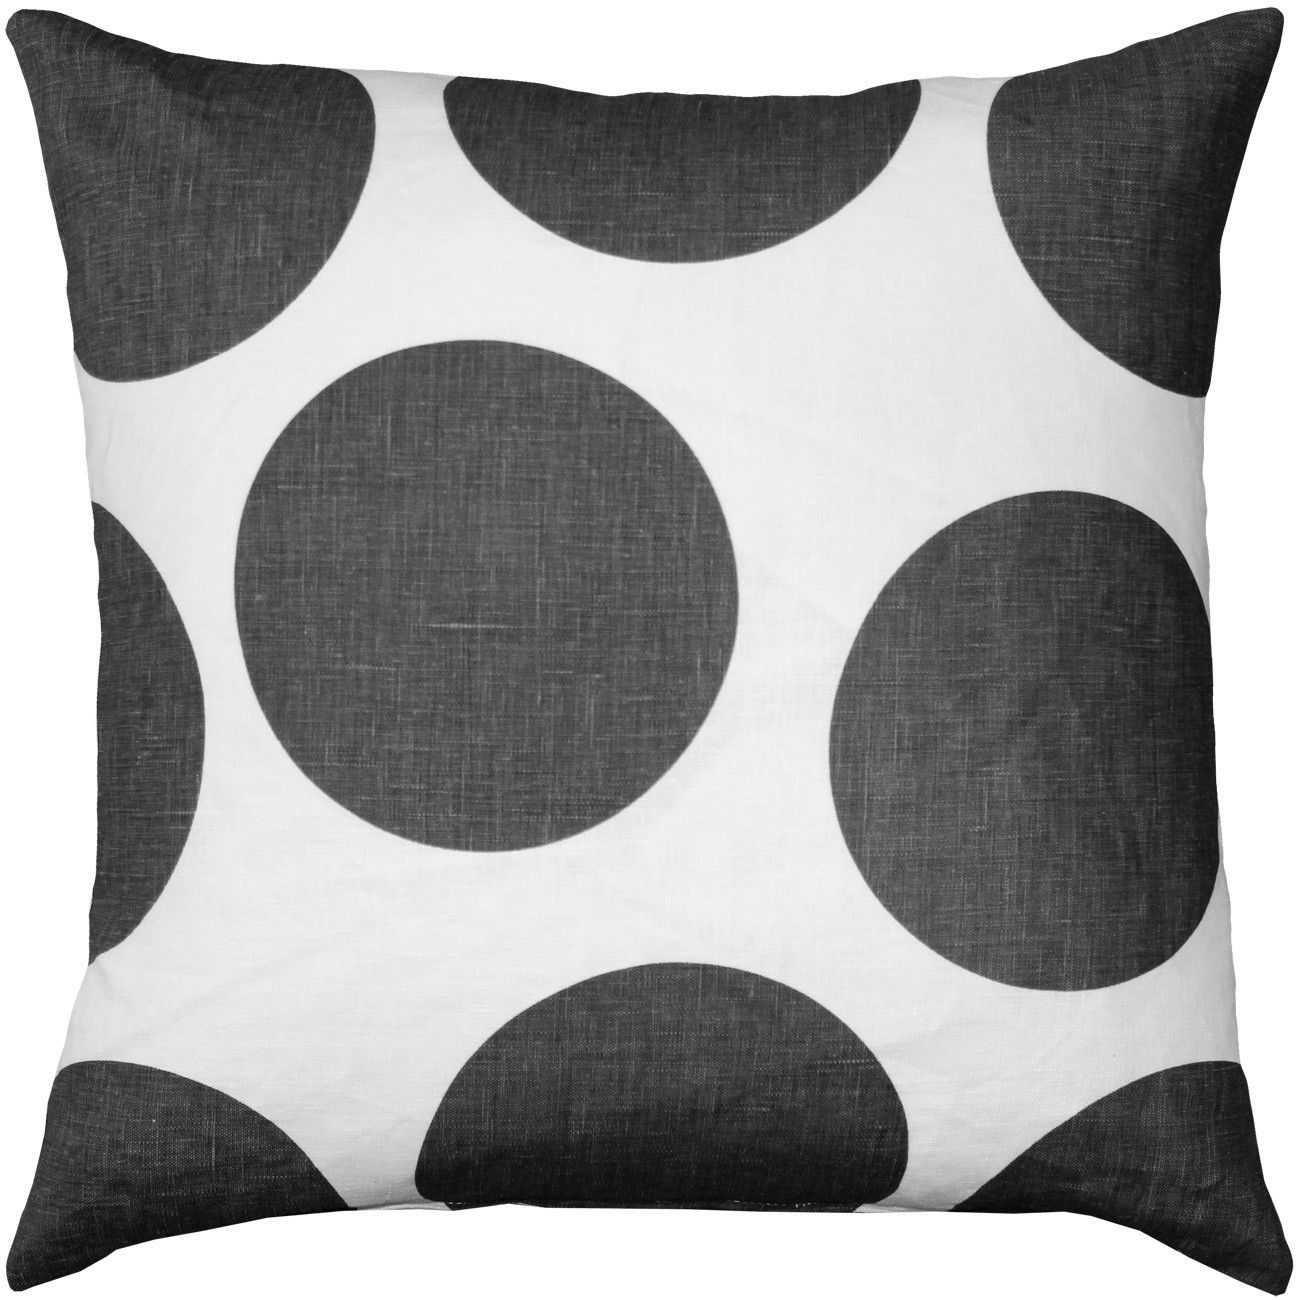 Tuscany Linen Gray Circles Pillow